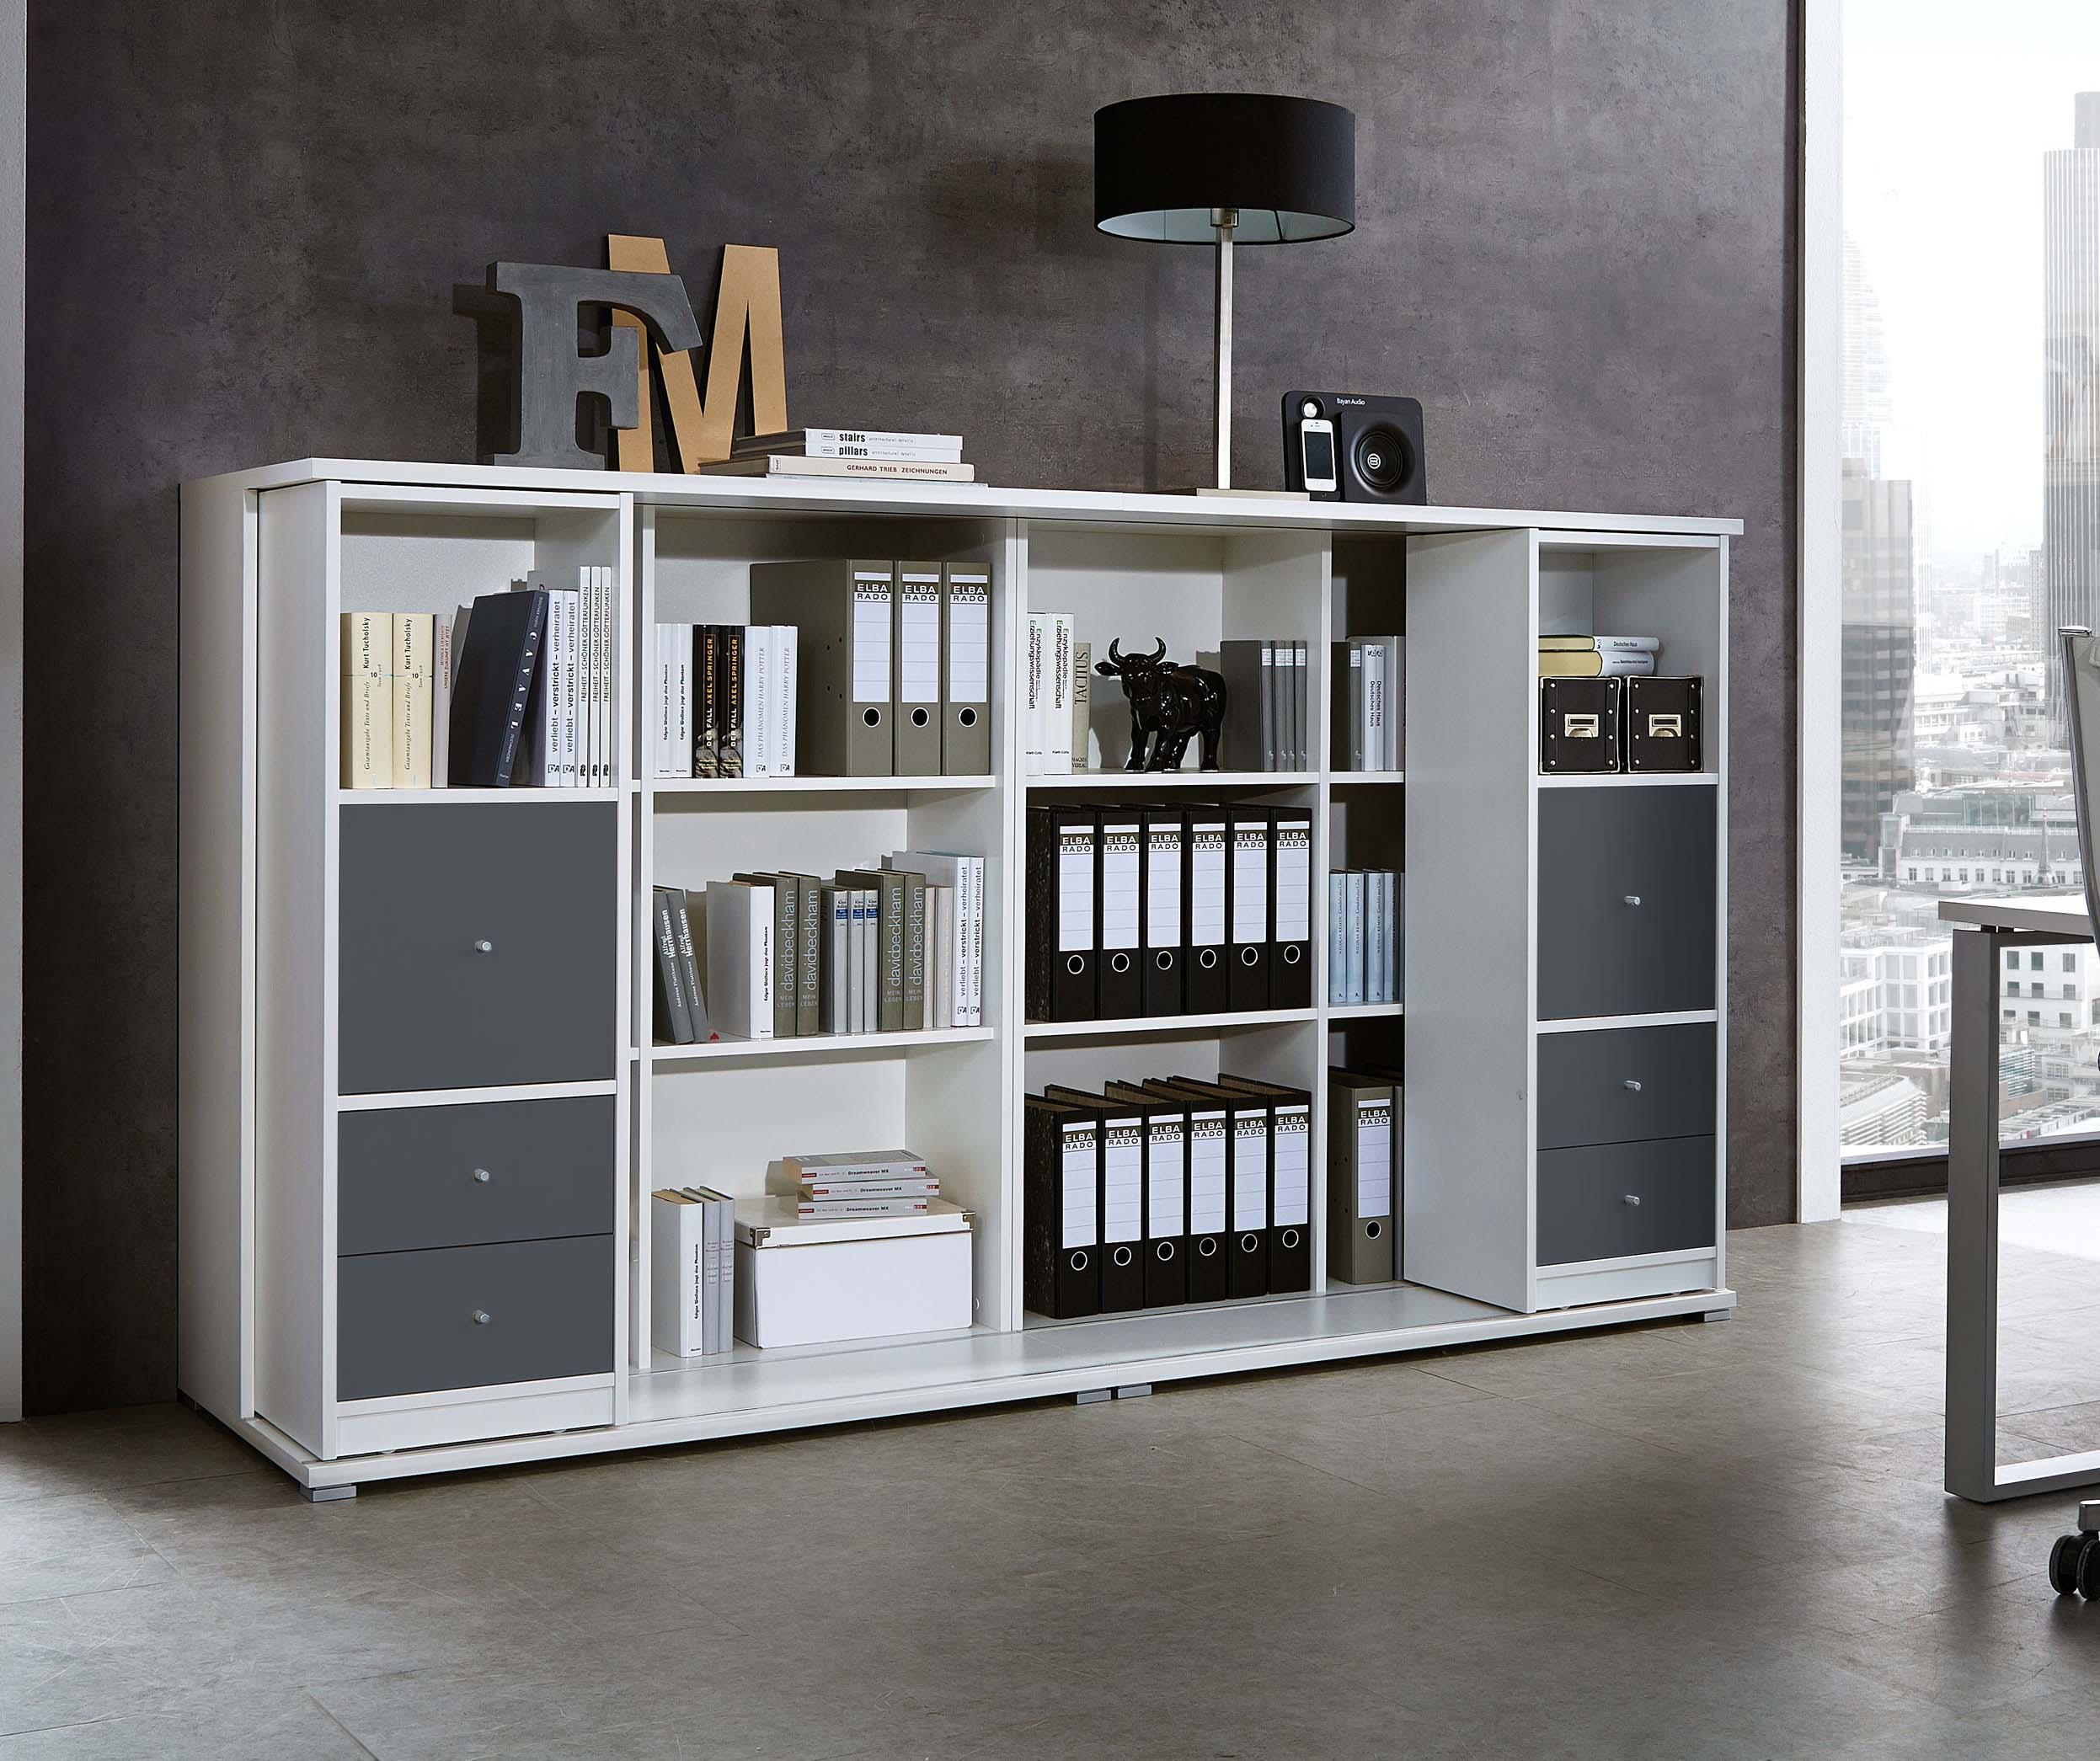 schieberegal aktenregal mehrzweckregal b cherregal regal b rom bel wei r514 ebay. Black Bedroom Furniture Sets. Home Design Ideas